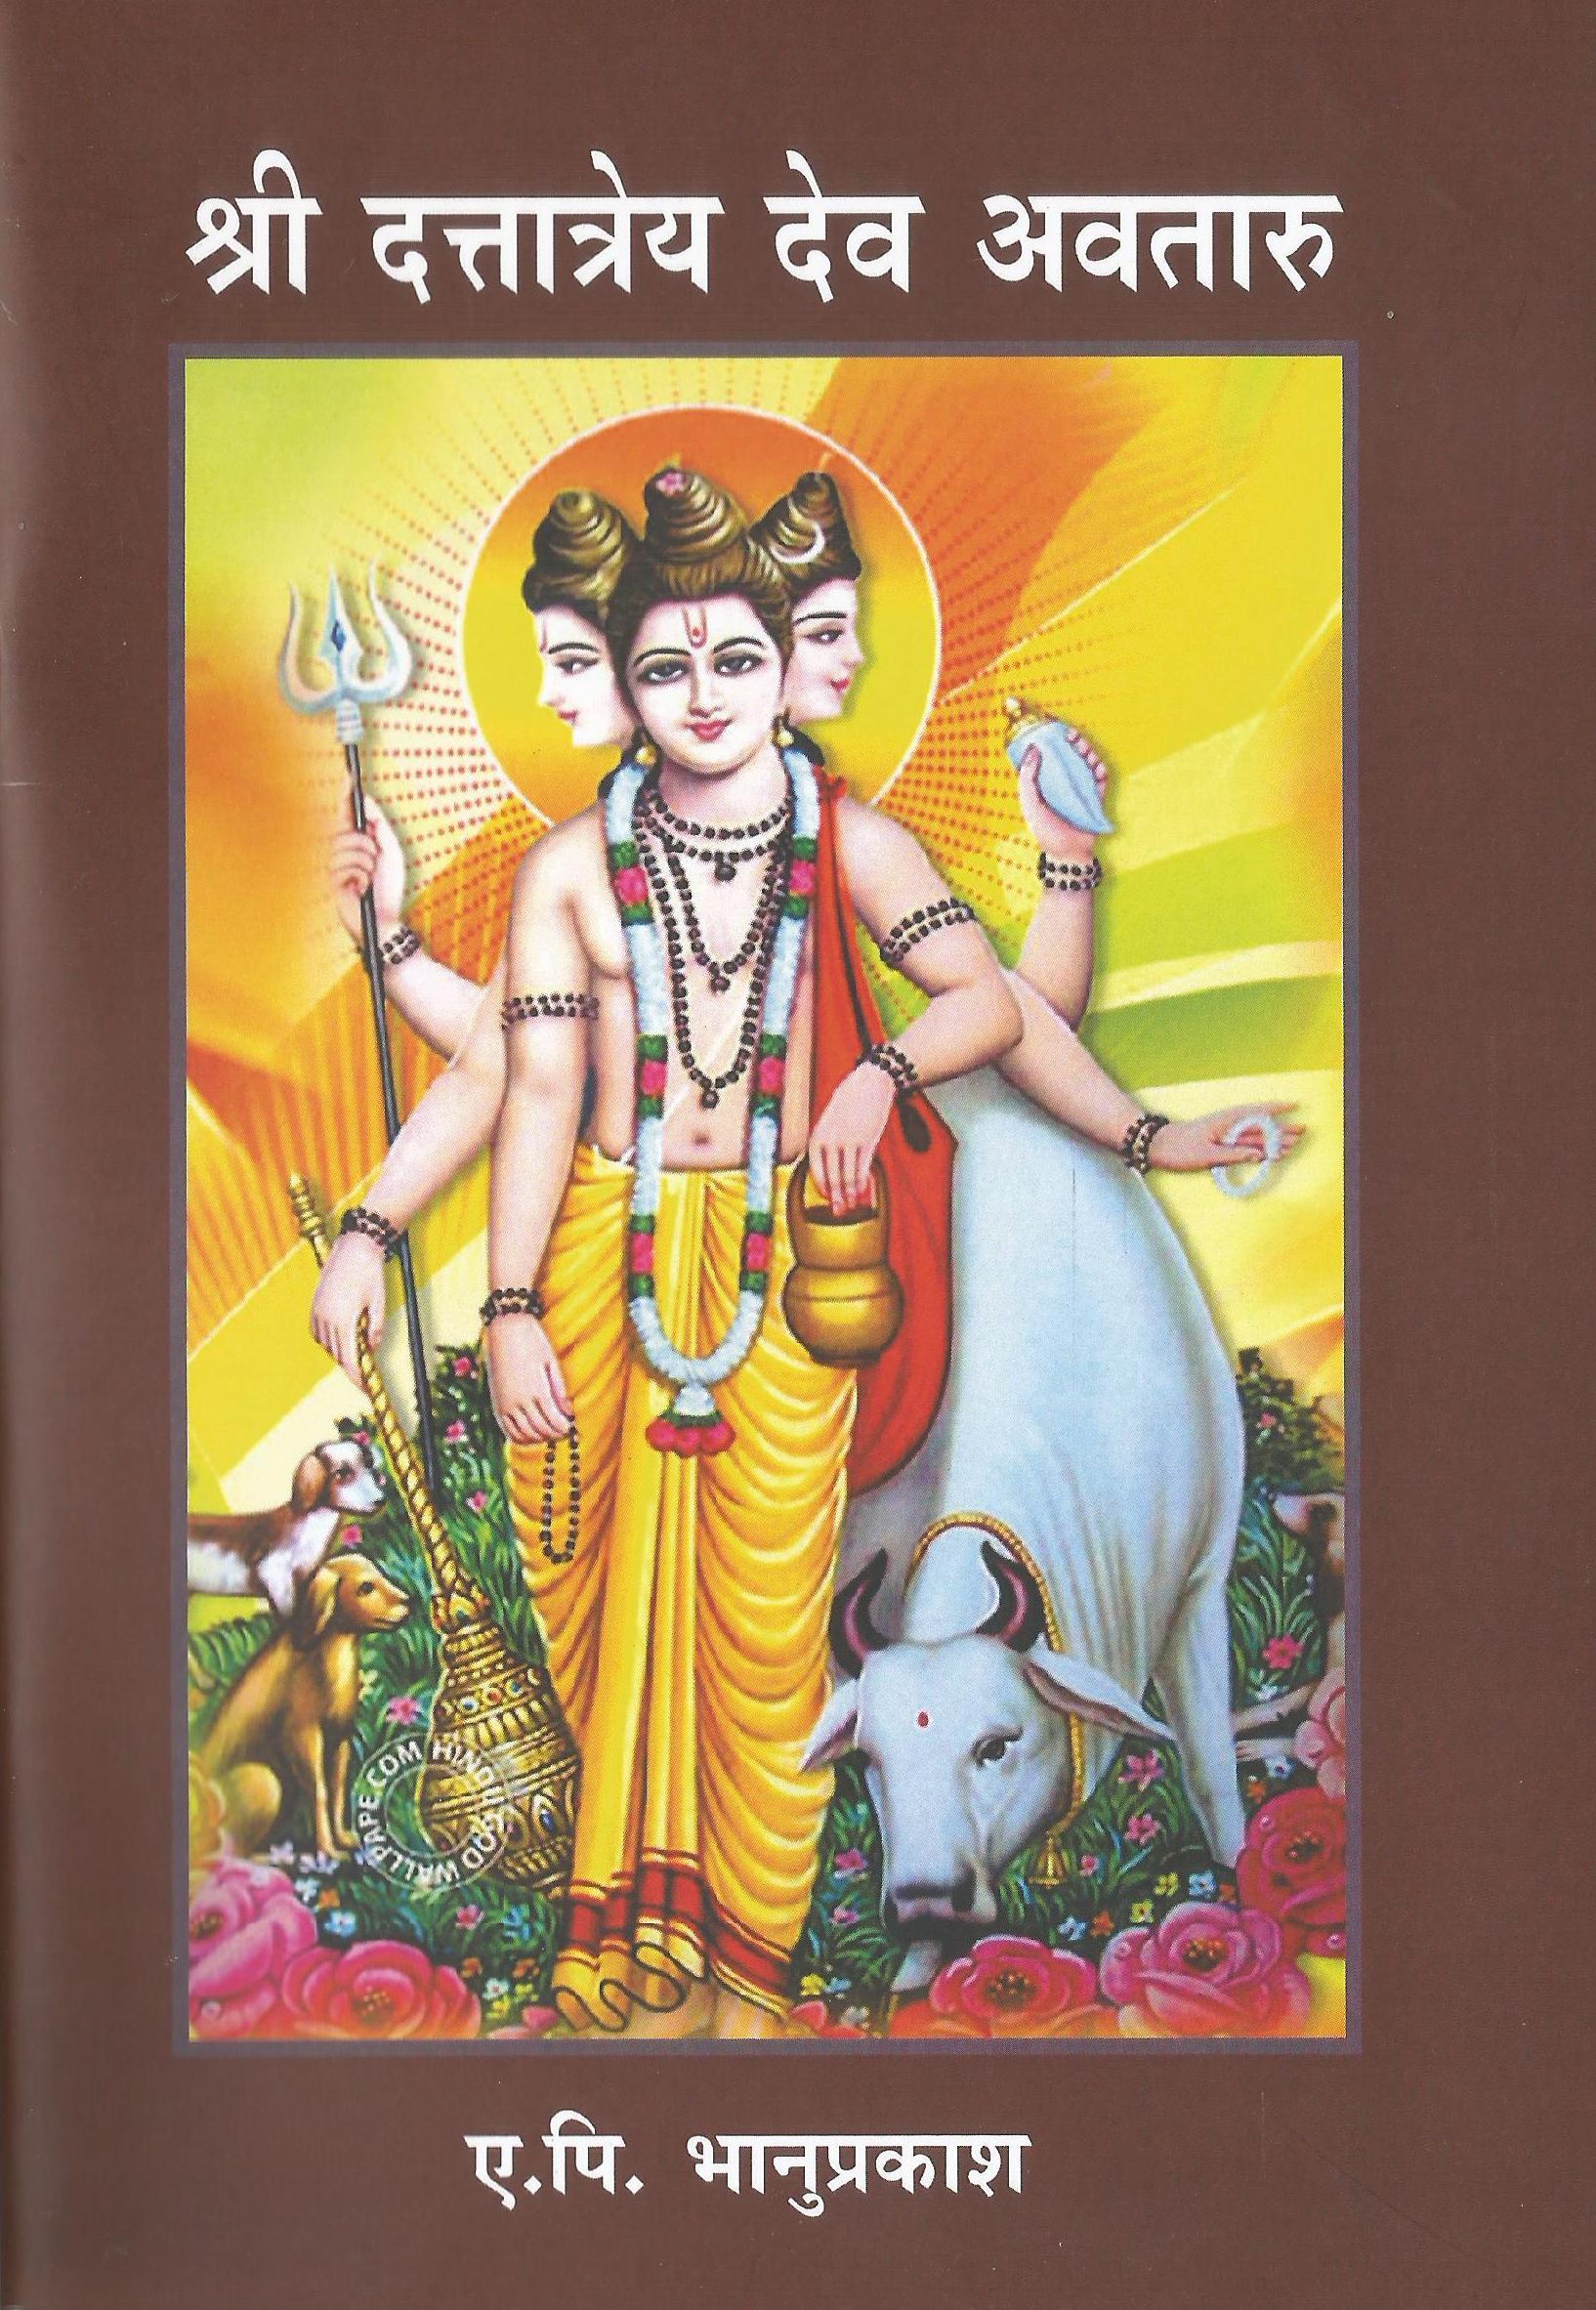 Sree Duttatreya Deva Avataaru